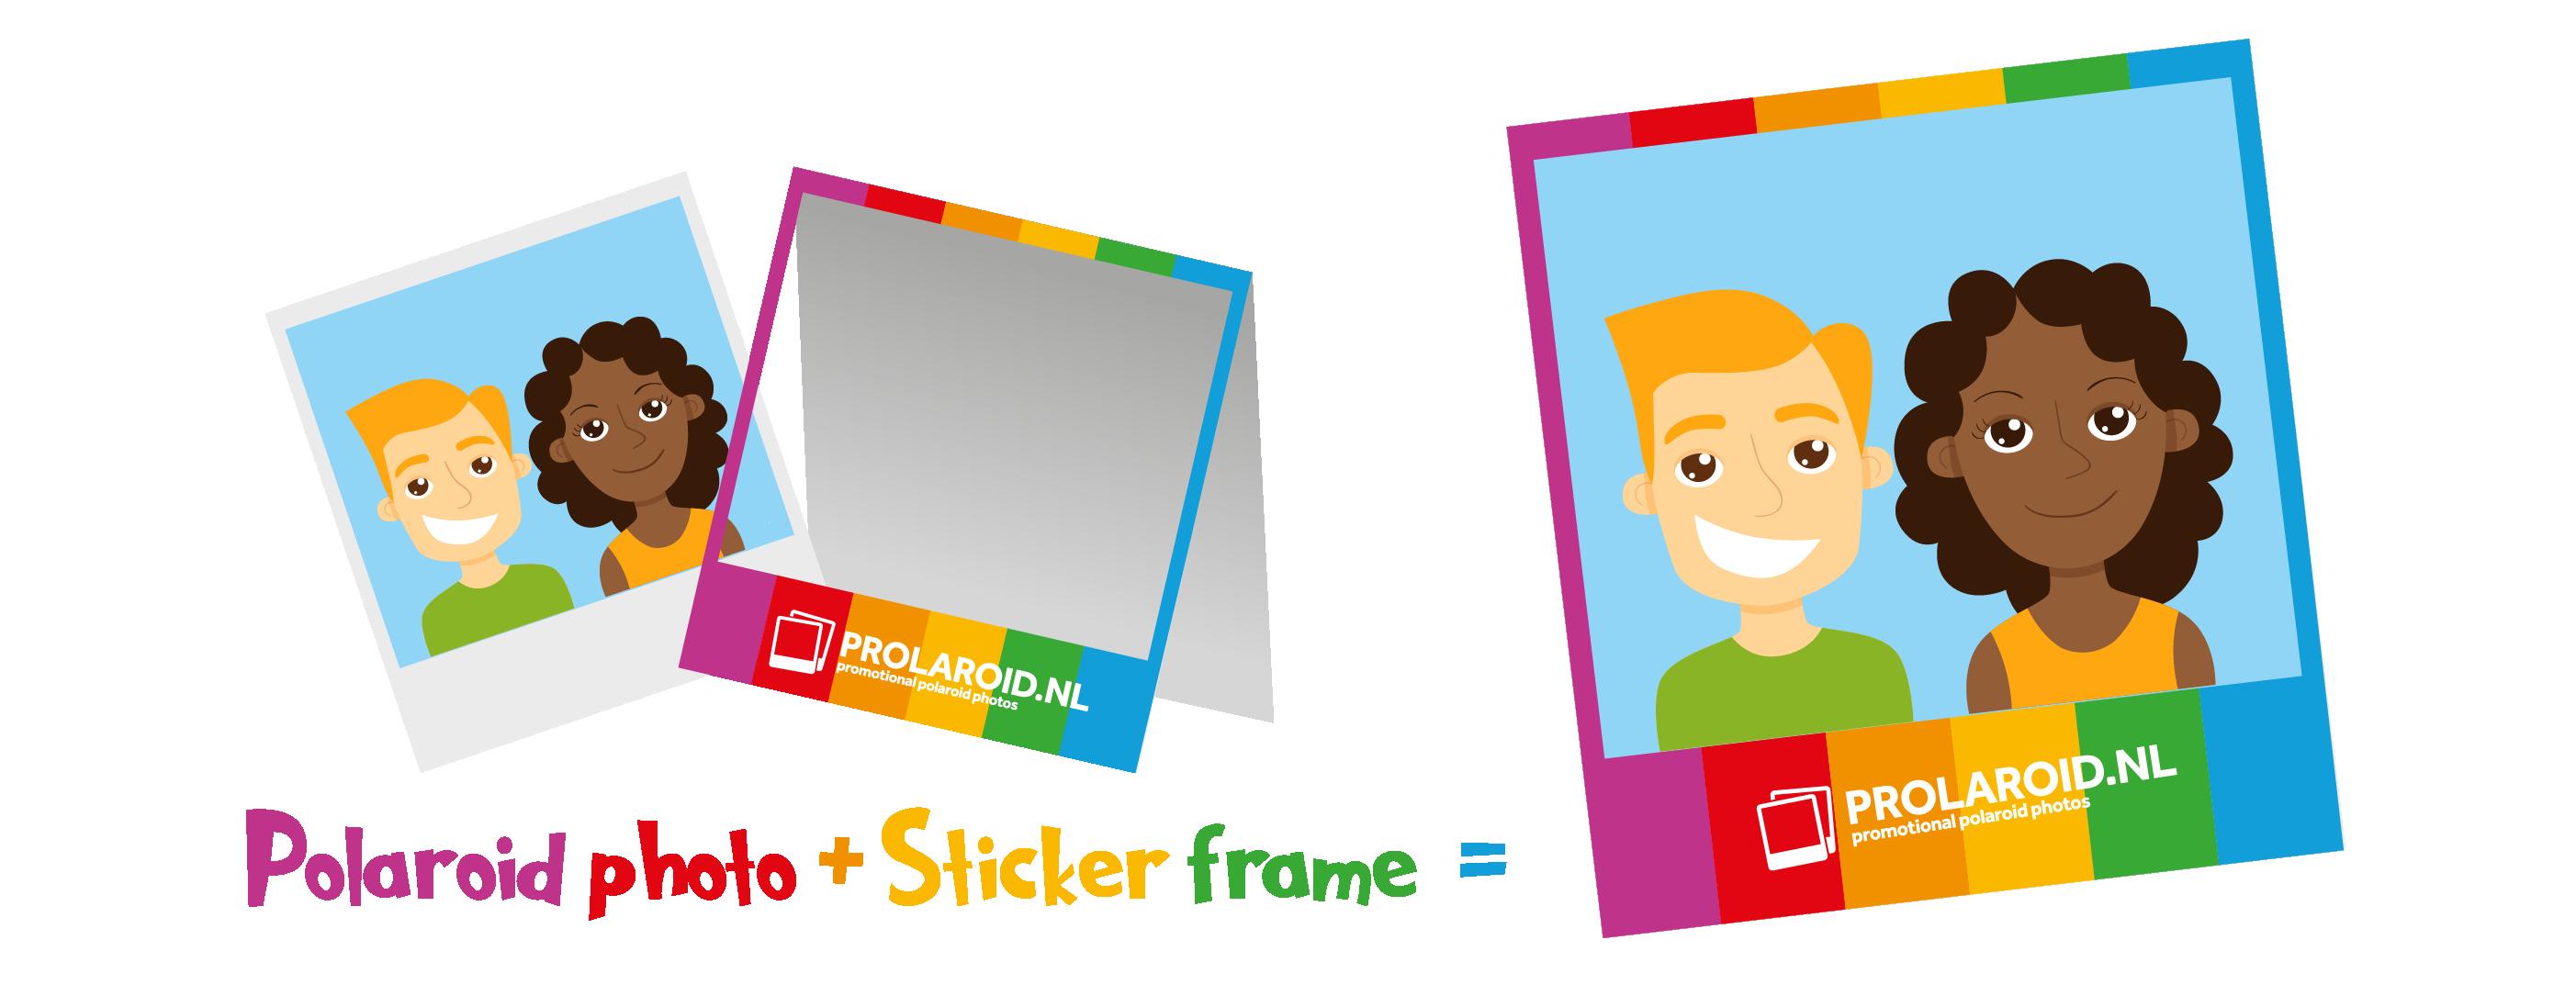 Polaroids met sticker frame